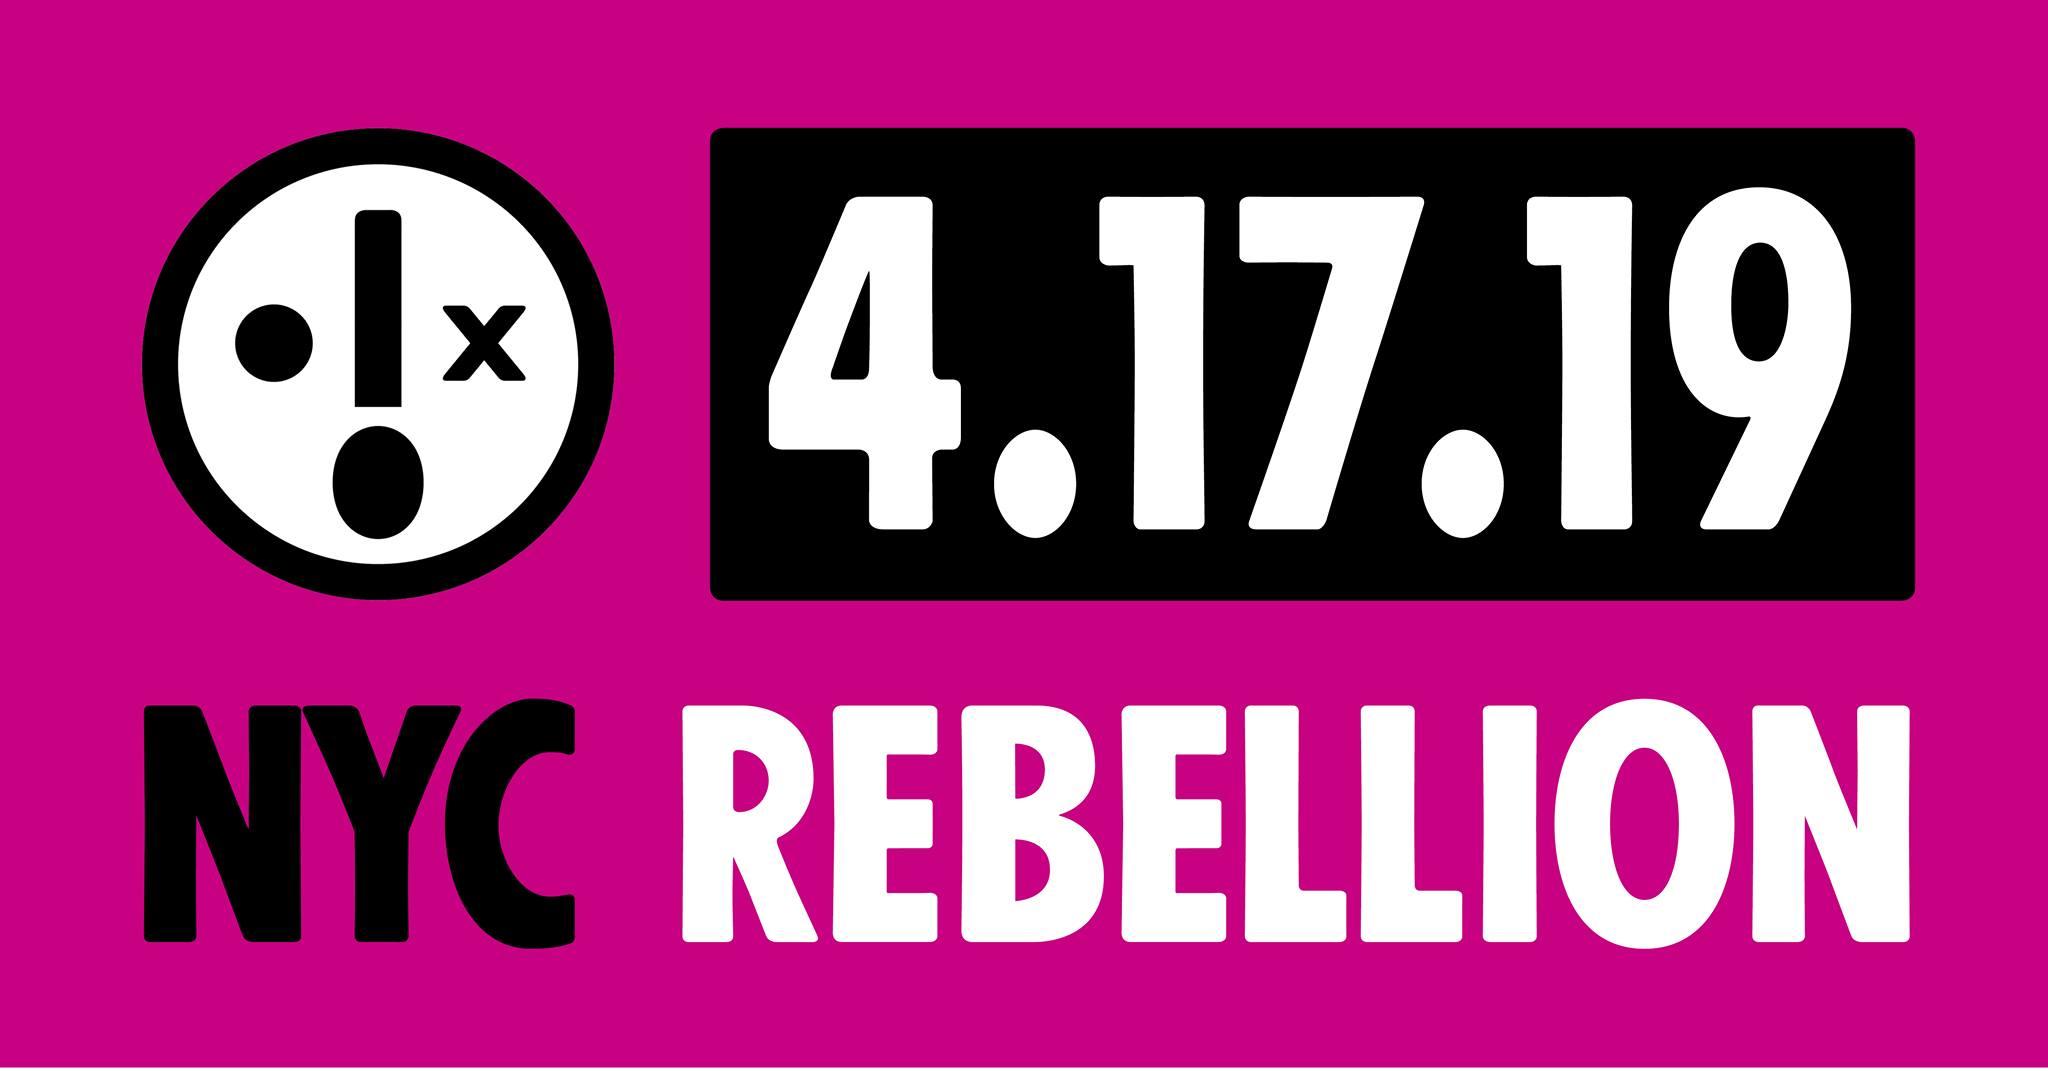 Nyc_rebellion_4-17-19